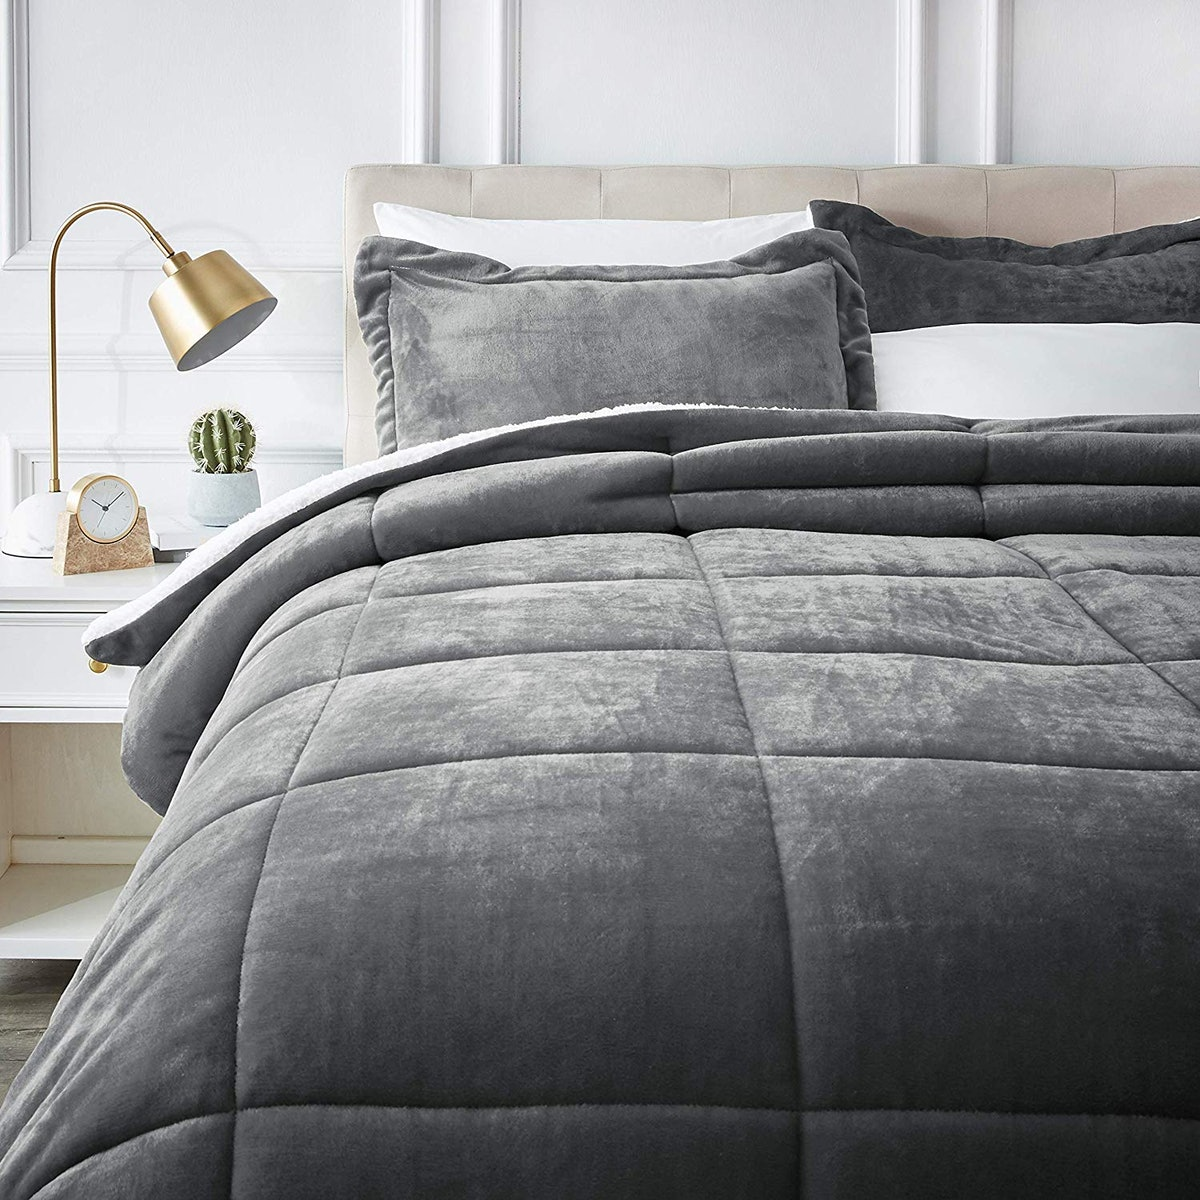 AmazonBasics Ultra-Soft Sherpa Comforter Bed Set